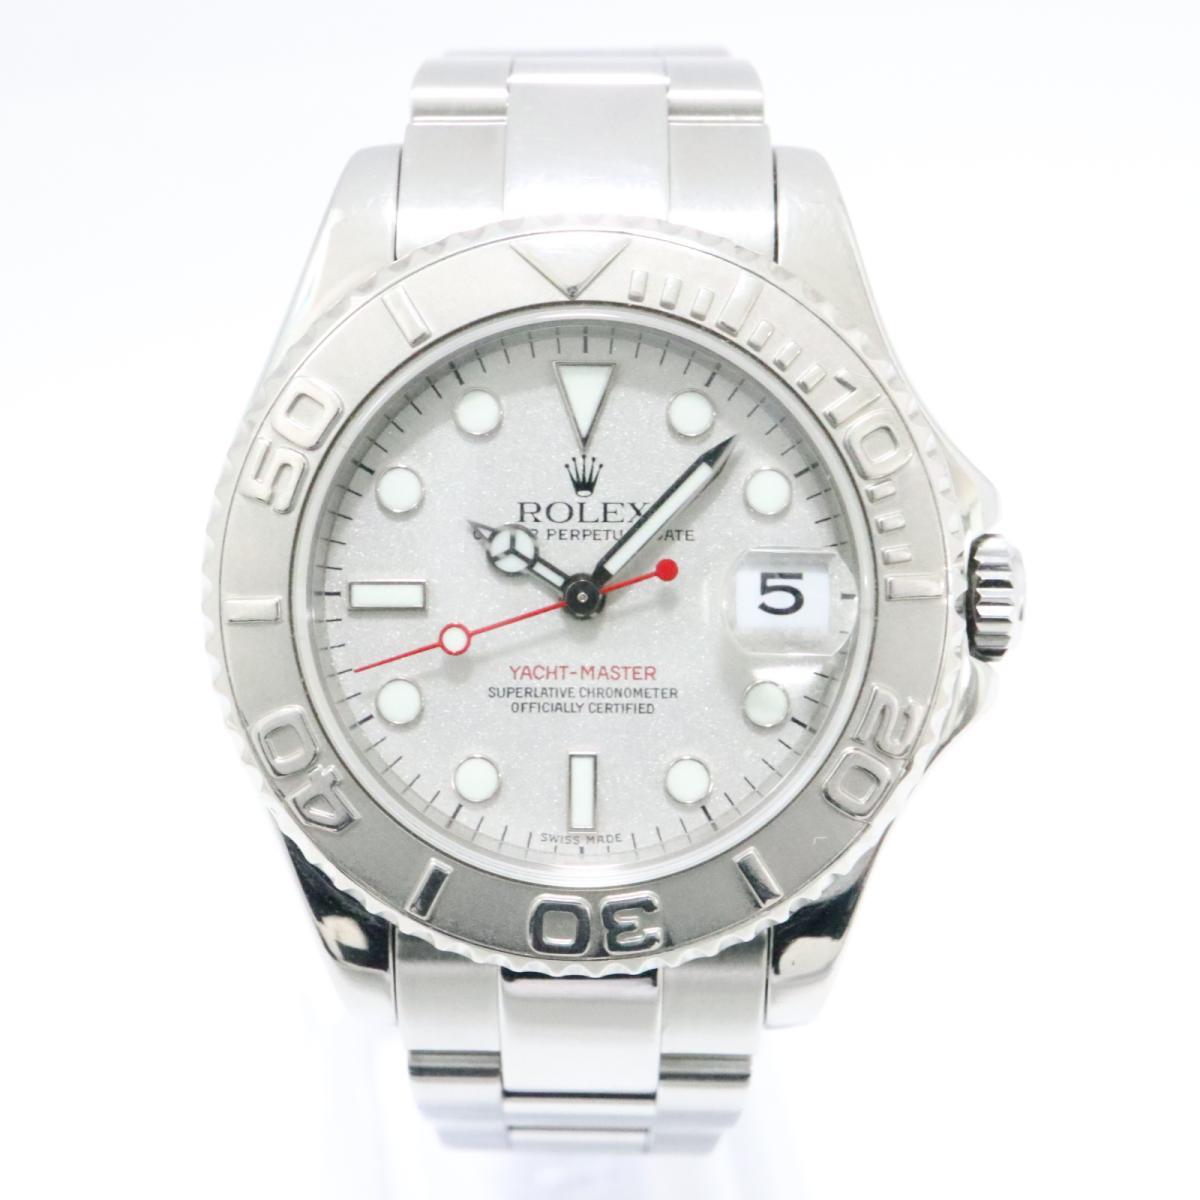 buy online f4729 f8934 楽天市場】ロレックス ヨットマスター ロレジウム 腕時計 時計 ...